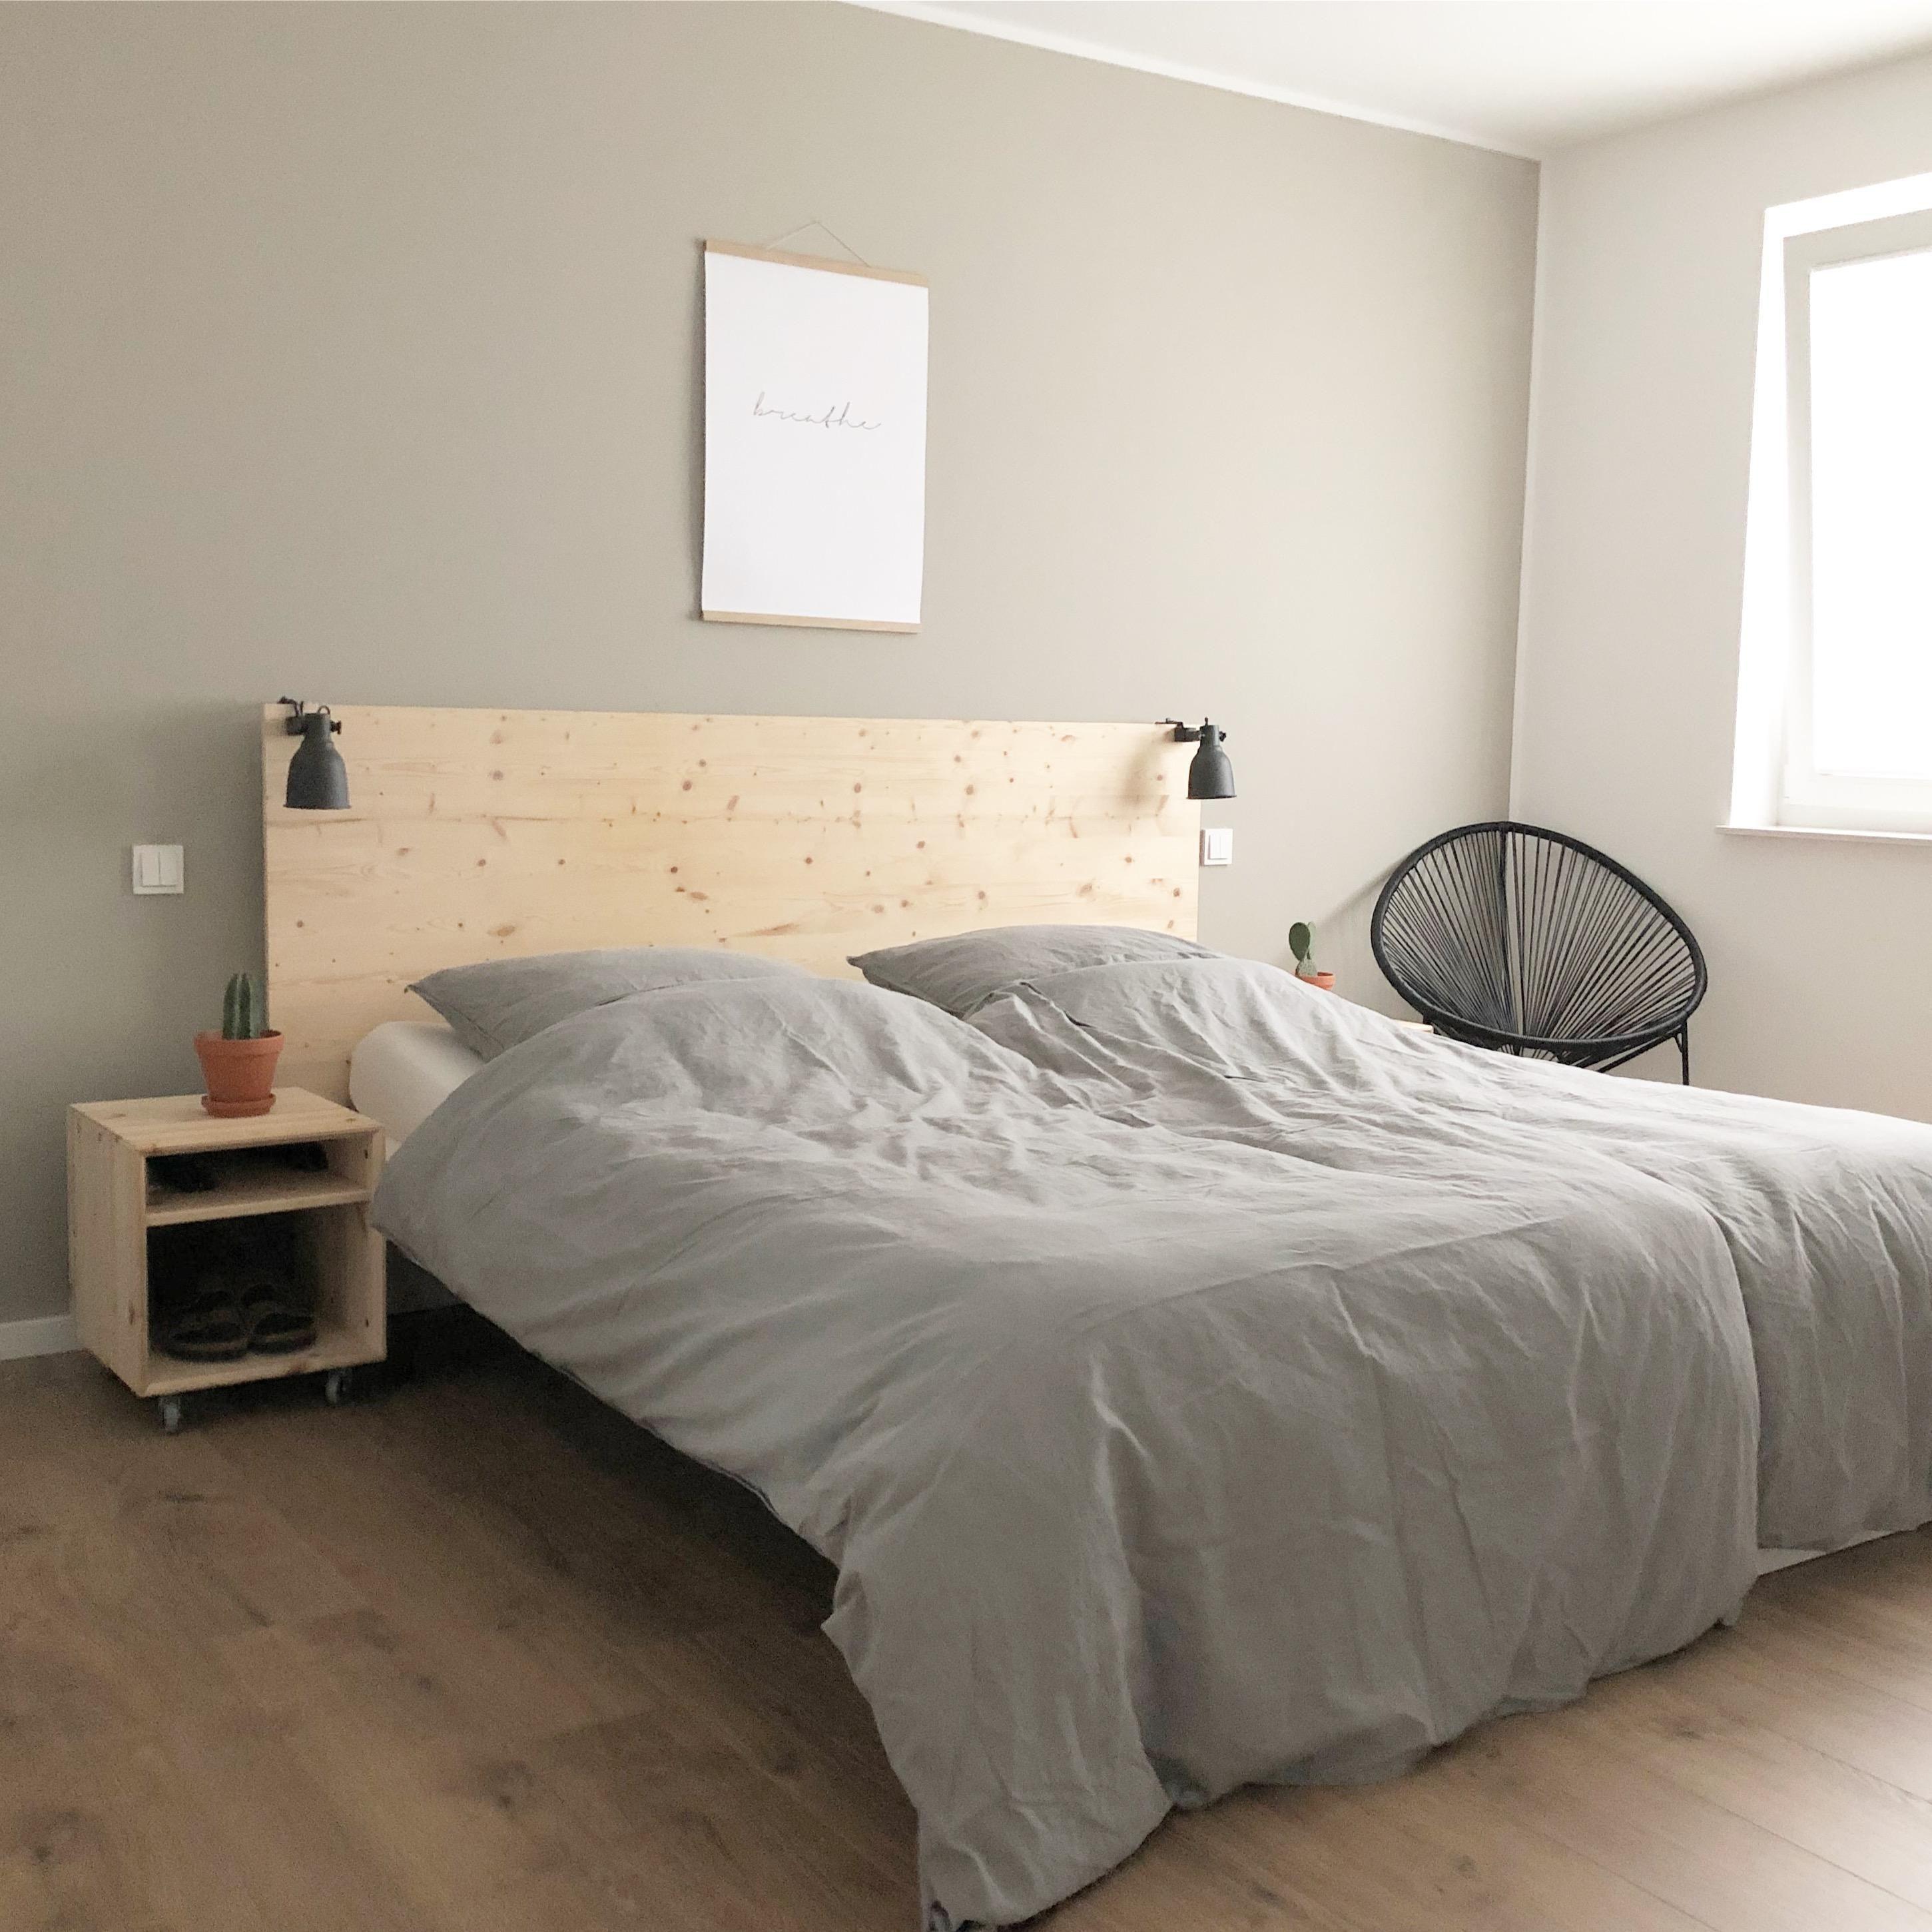 Bedroom Schlafzimmer Bett Diy Malm Ikea Ikea